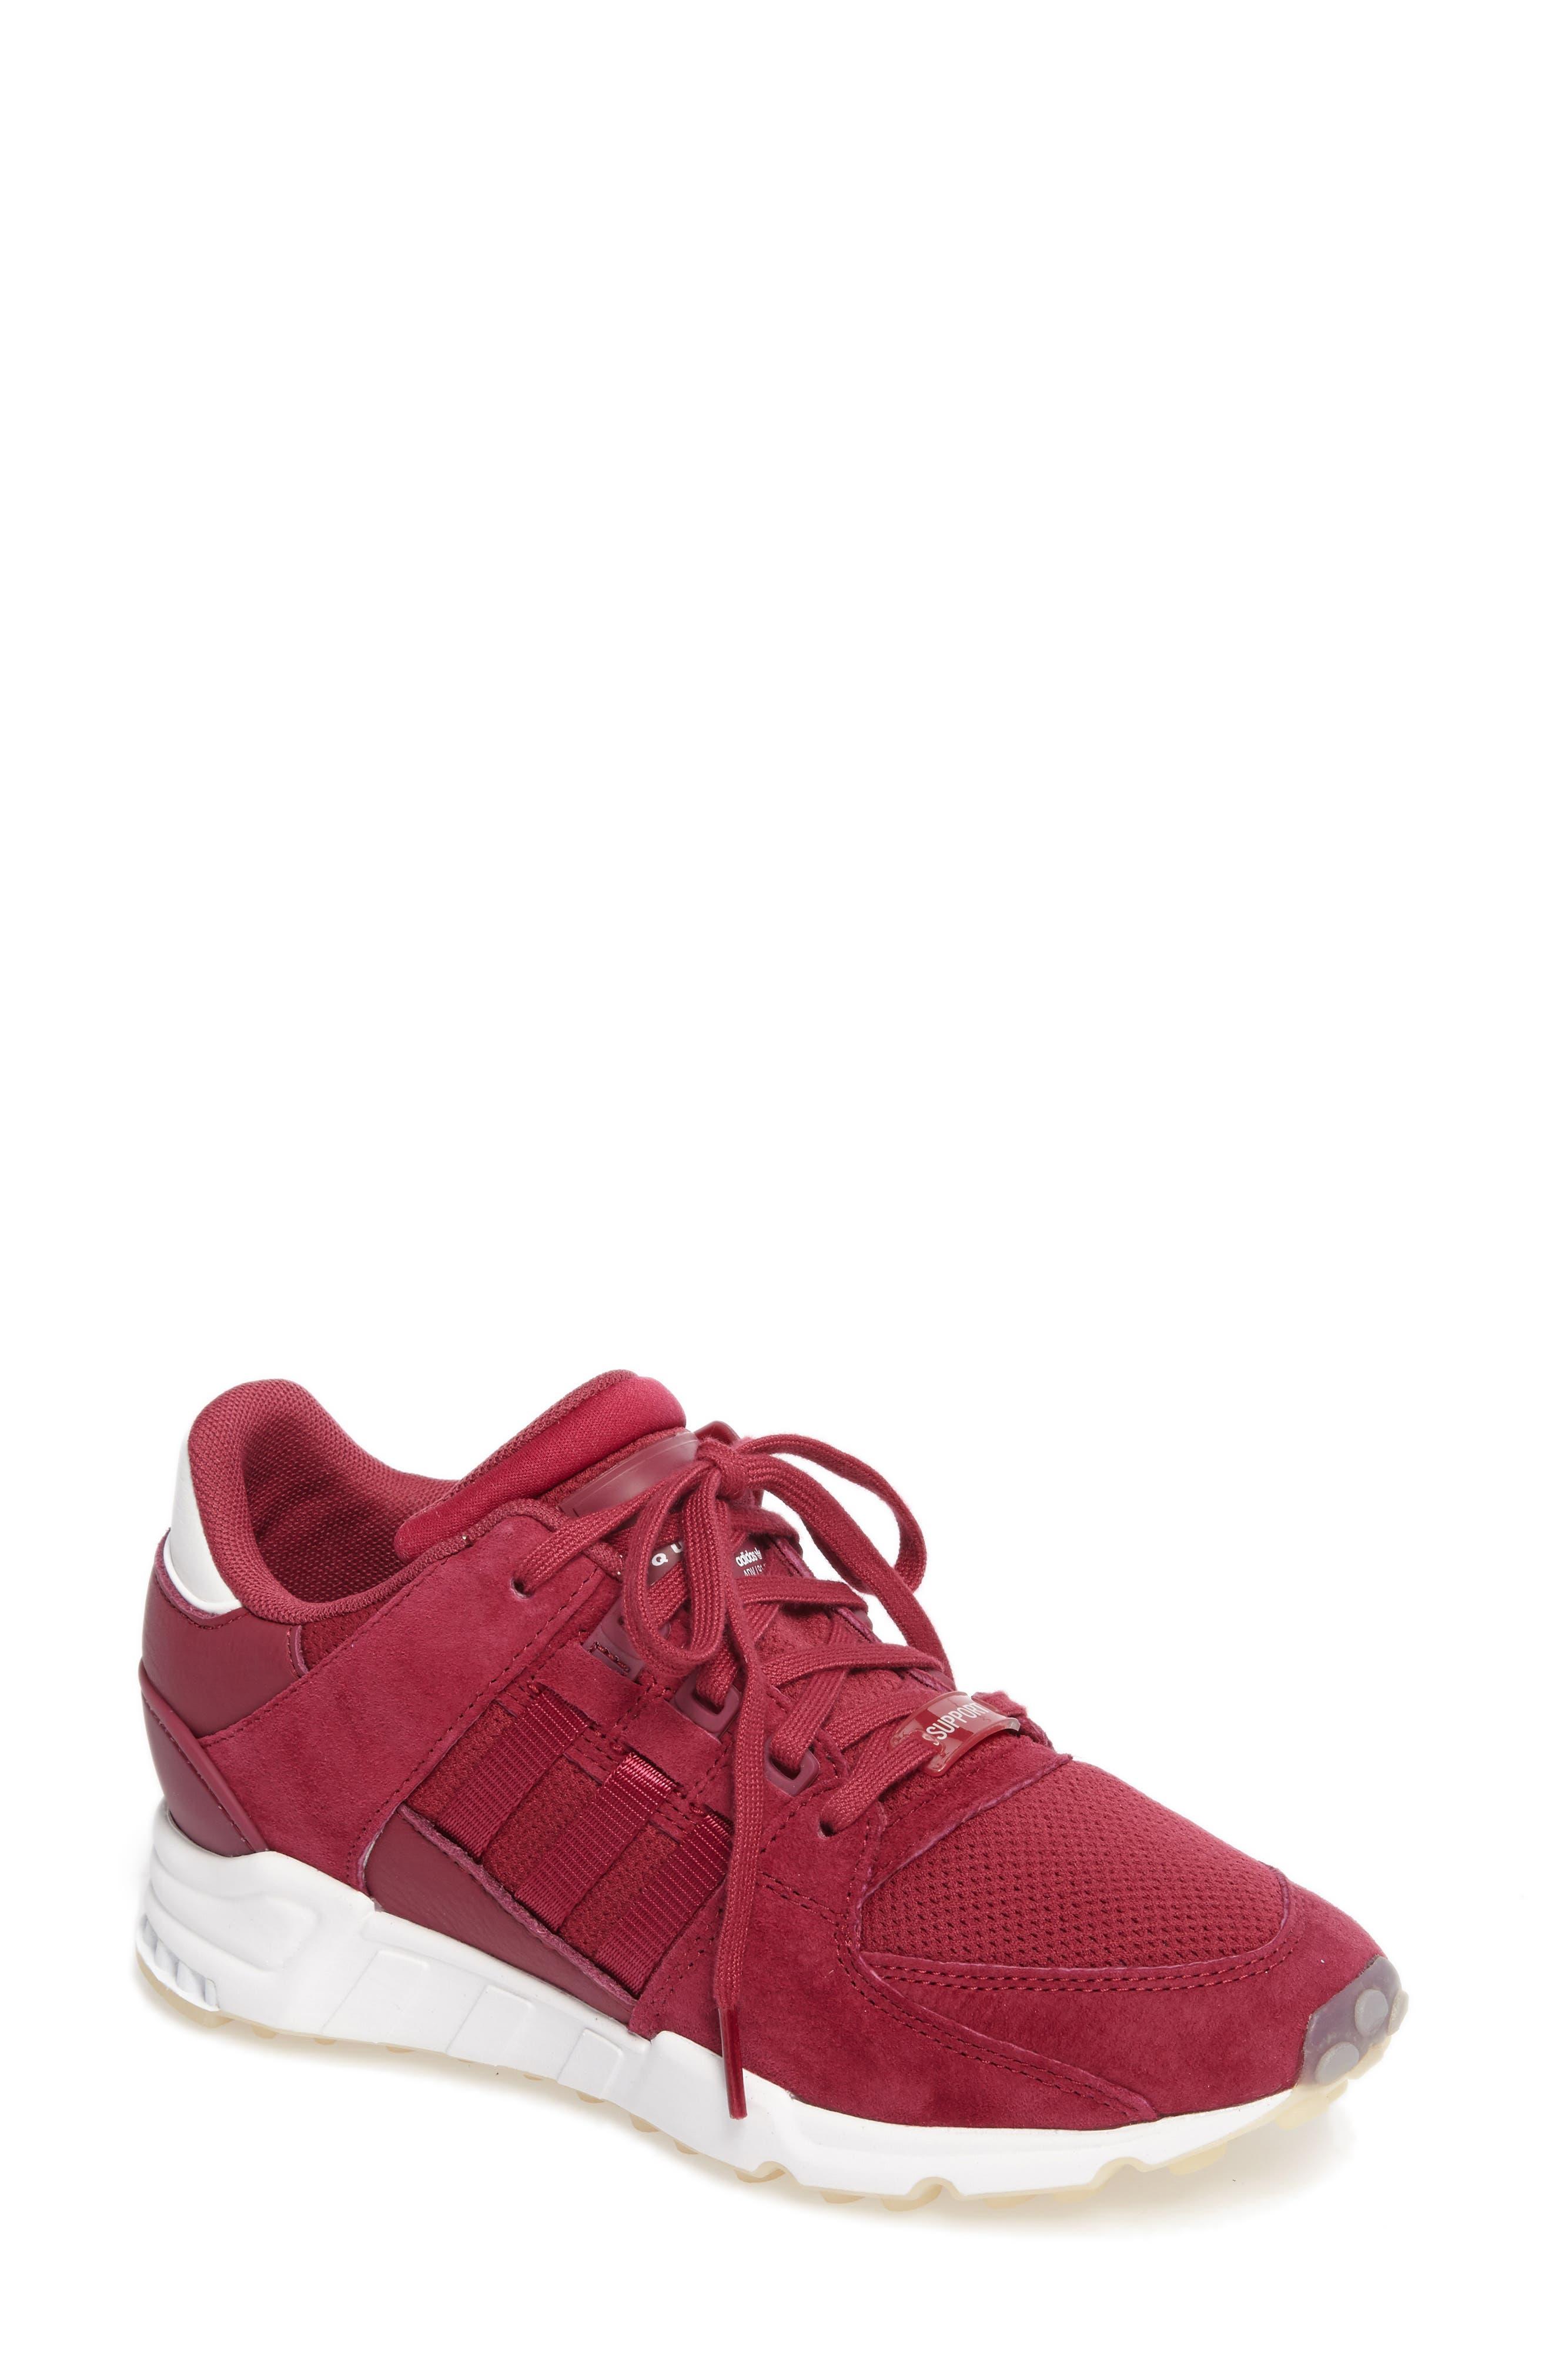 Main Image - adidas EQT Support RF Sneaker (Women)